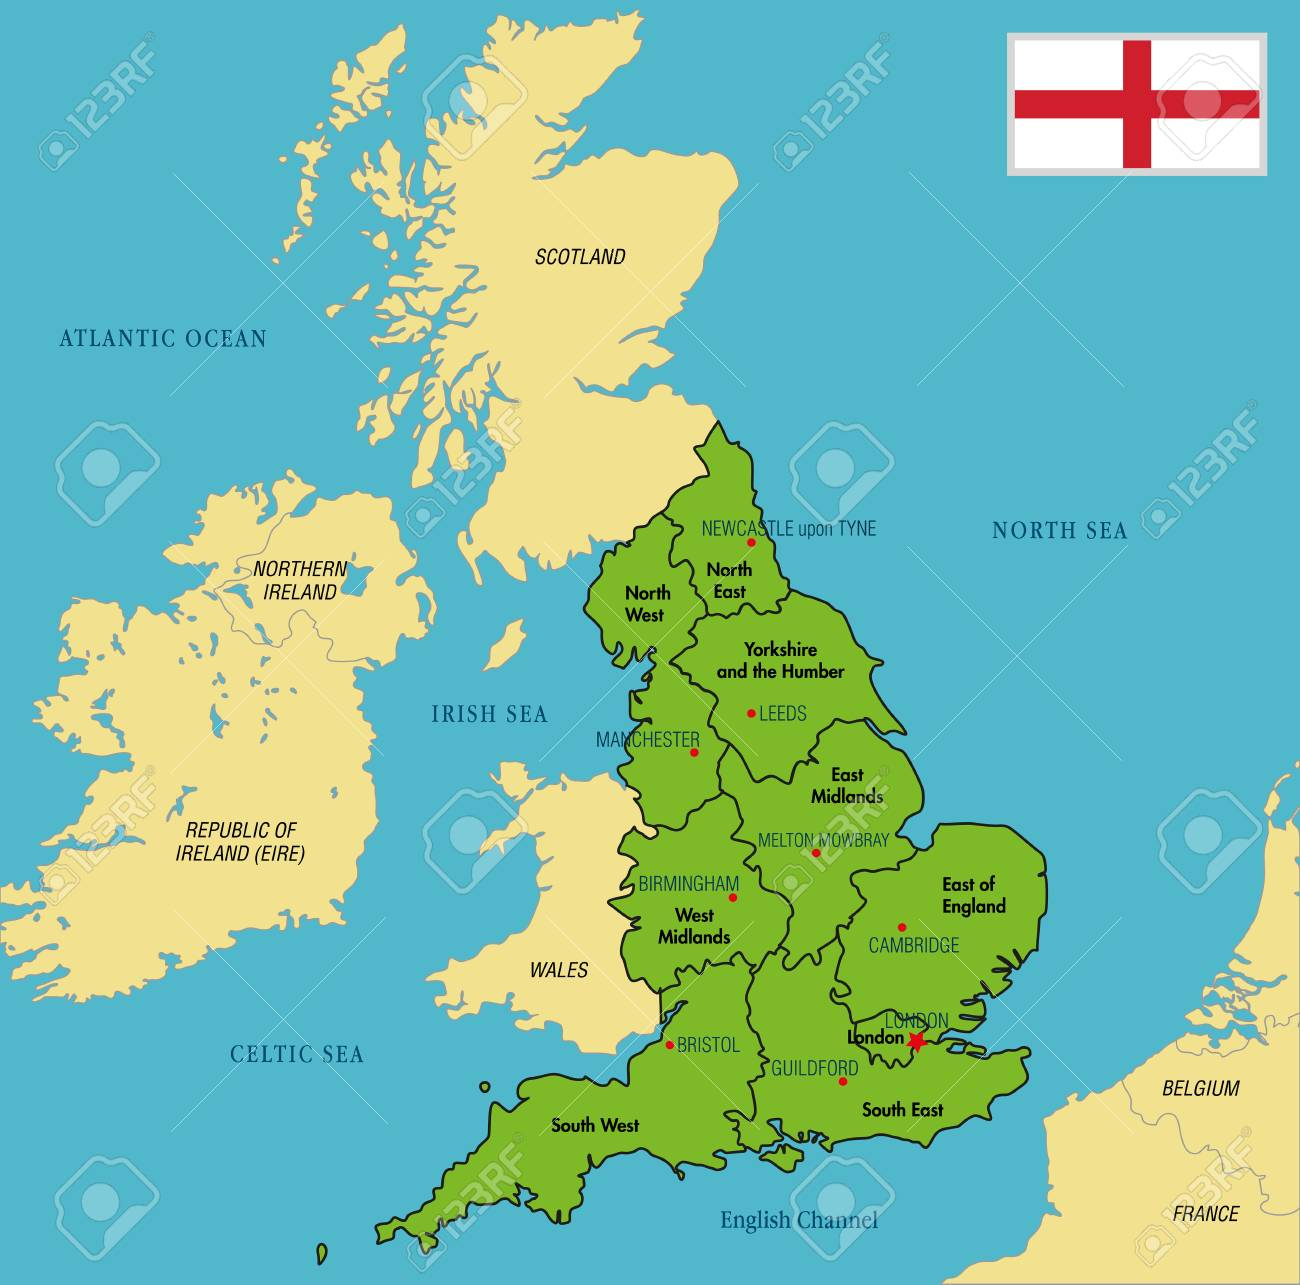 england karte regionen Vector Sehr Detaillierte Politische Karte Von England Mit Regionen  england karte regionen